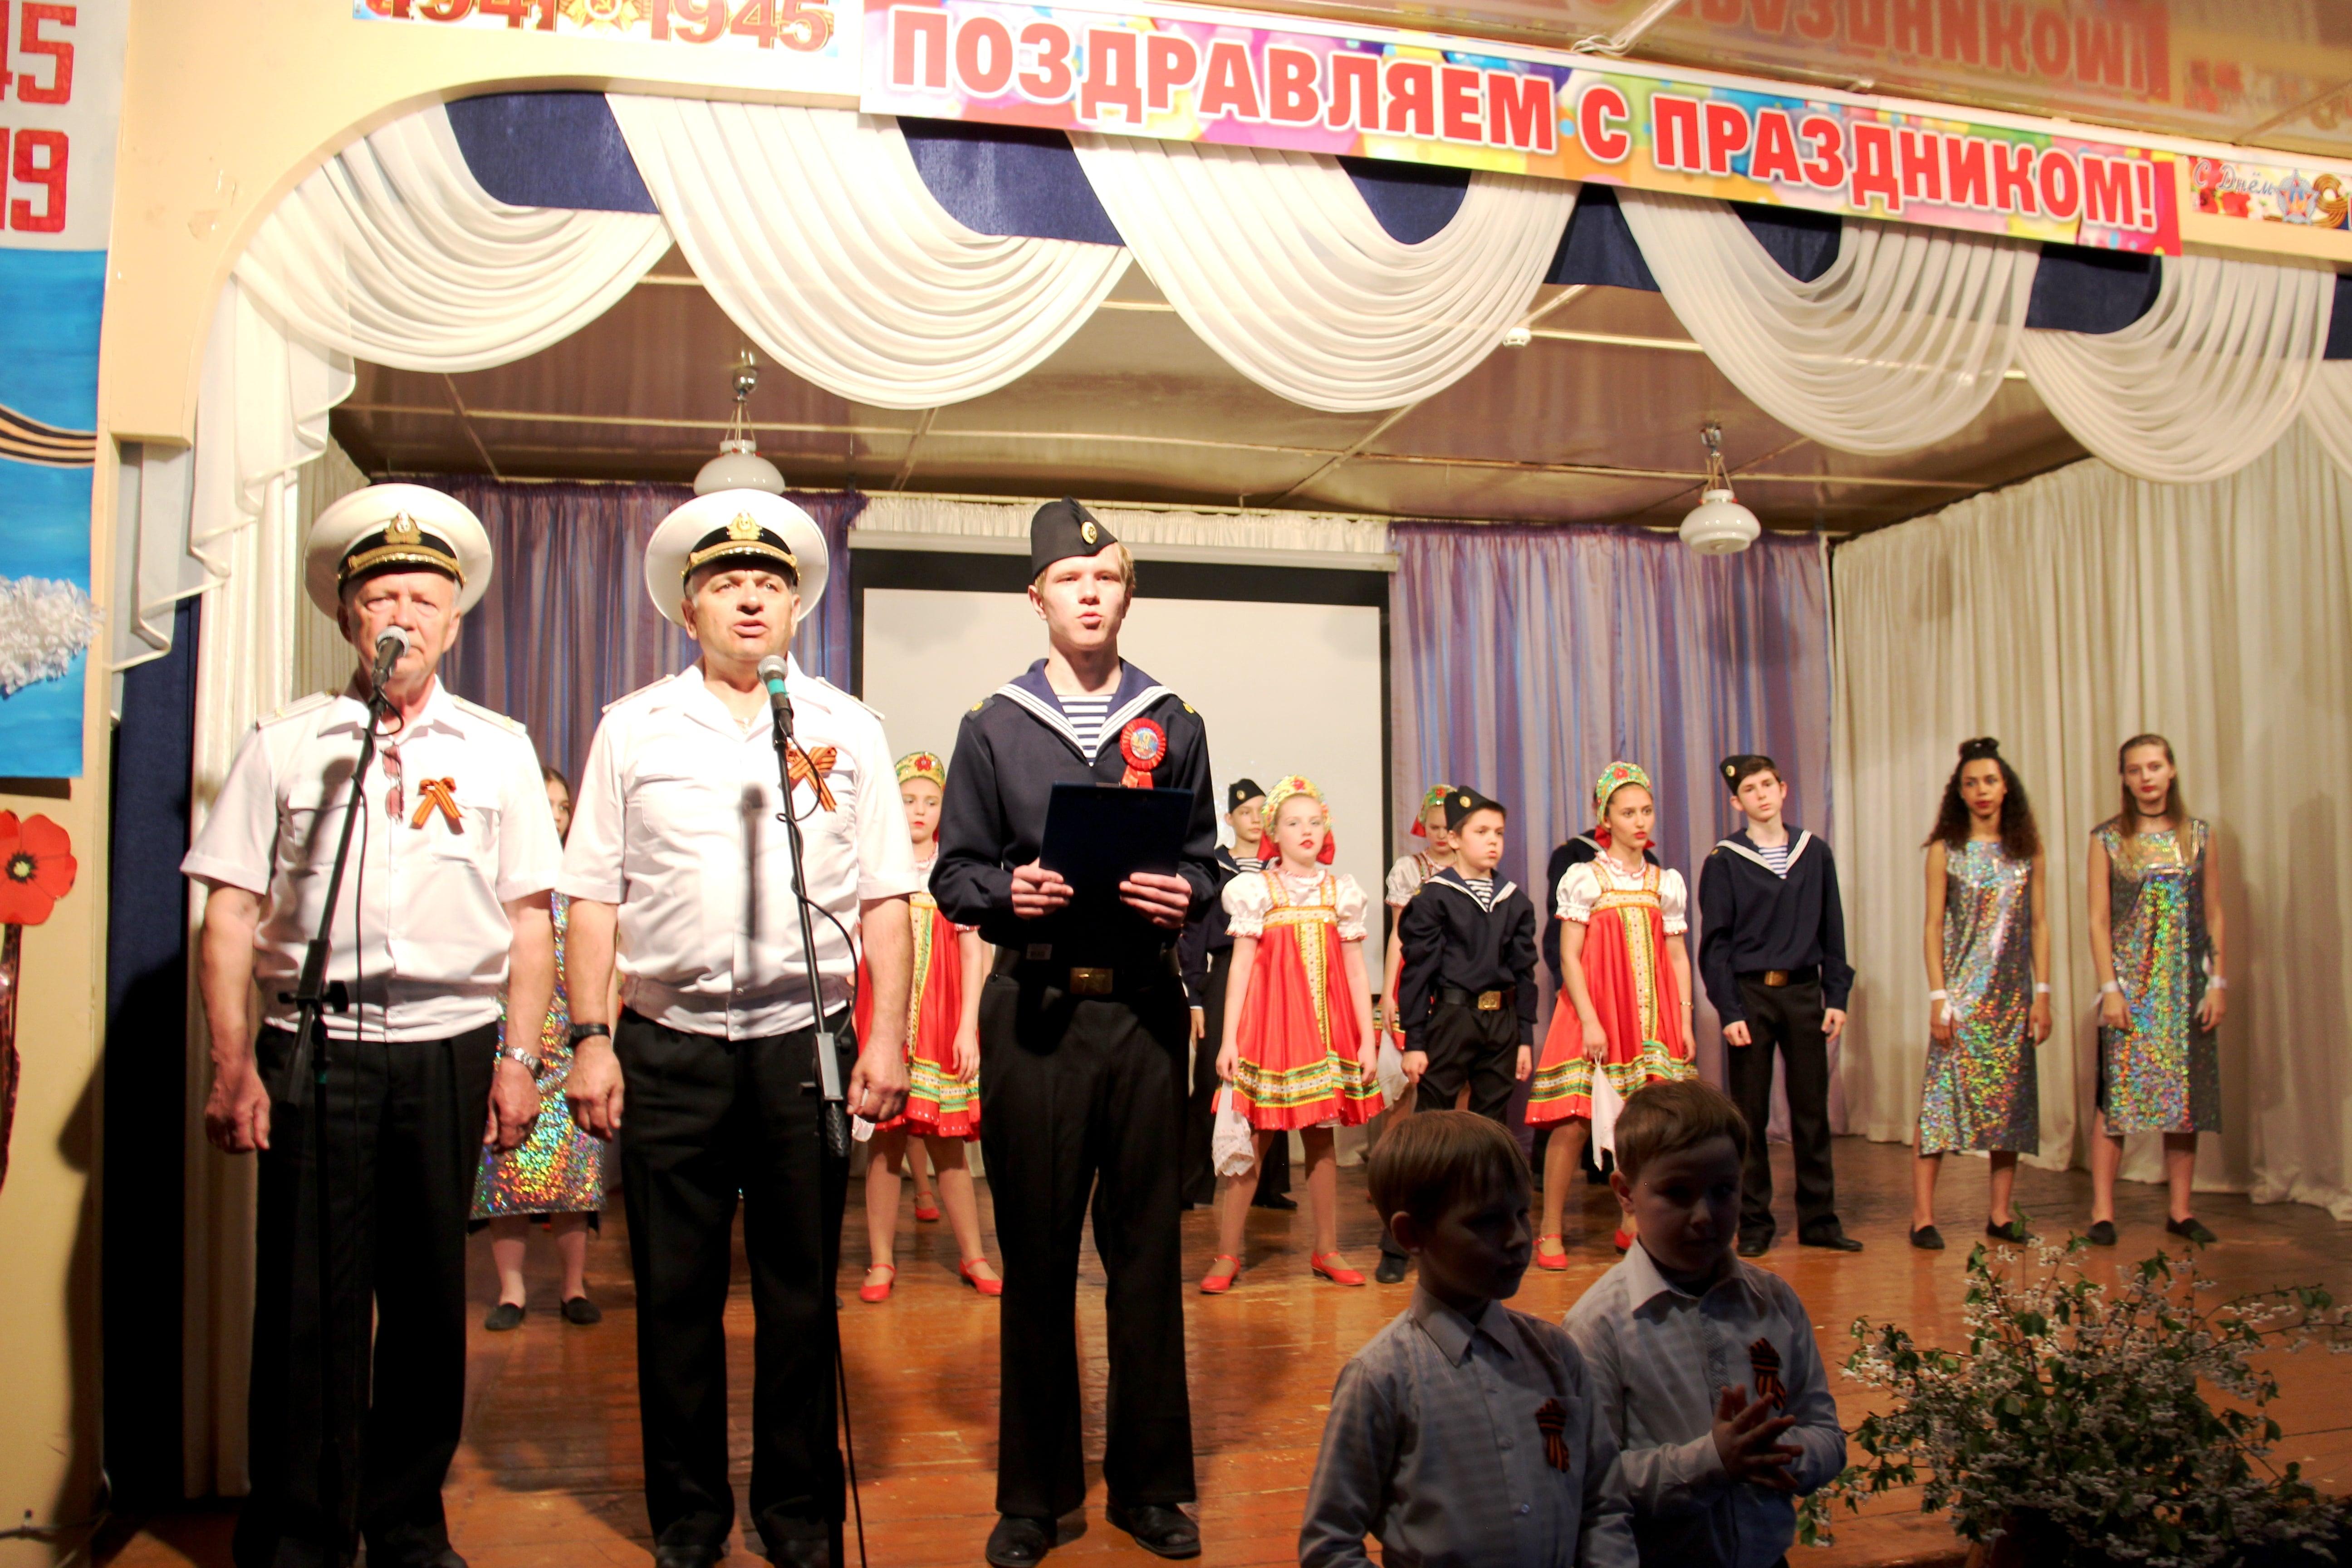 http://monuspen.ru/photoreports/b3afe9db7b5af7083492e2c5aff7c182.JPG